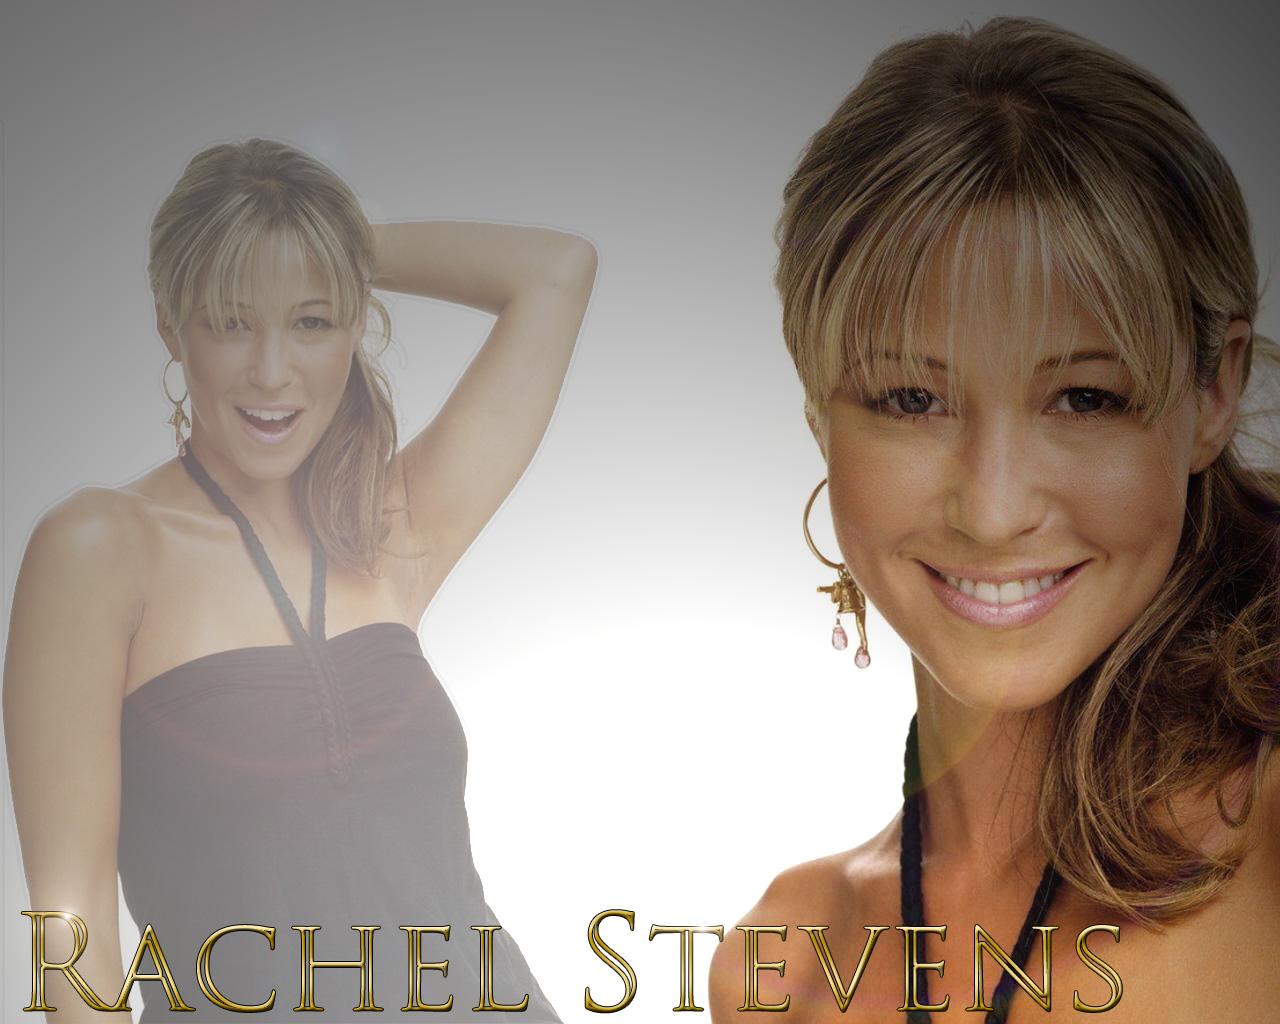 Rachel Stevens - Images Actress